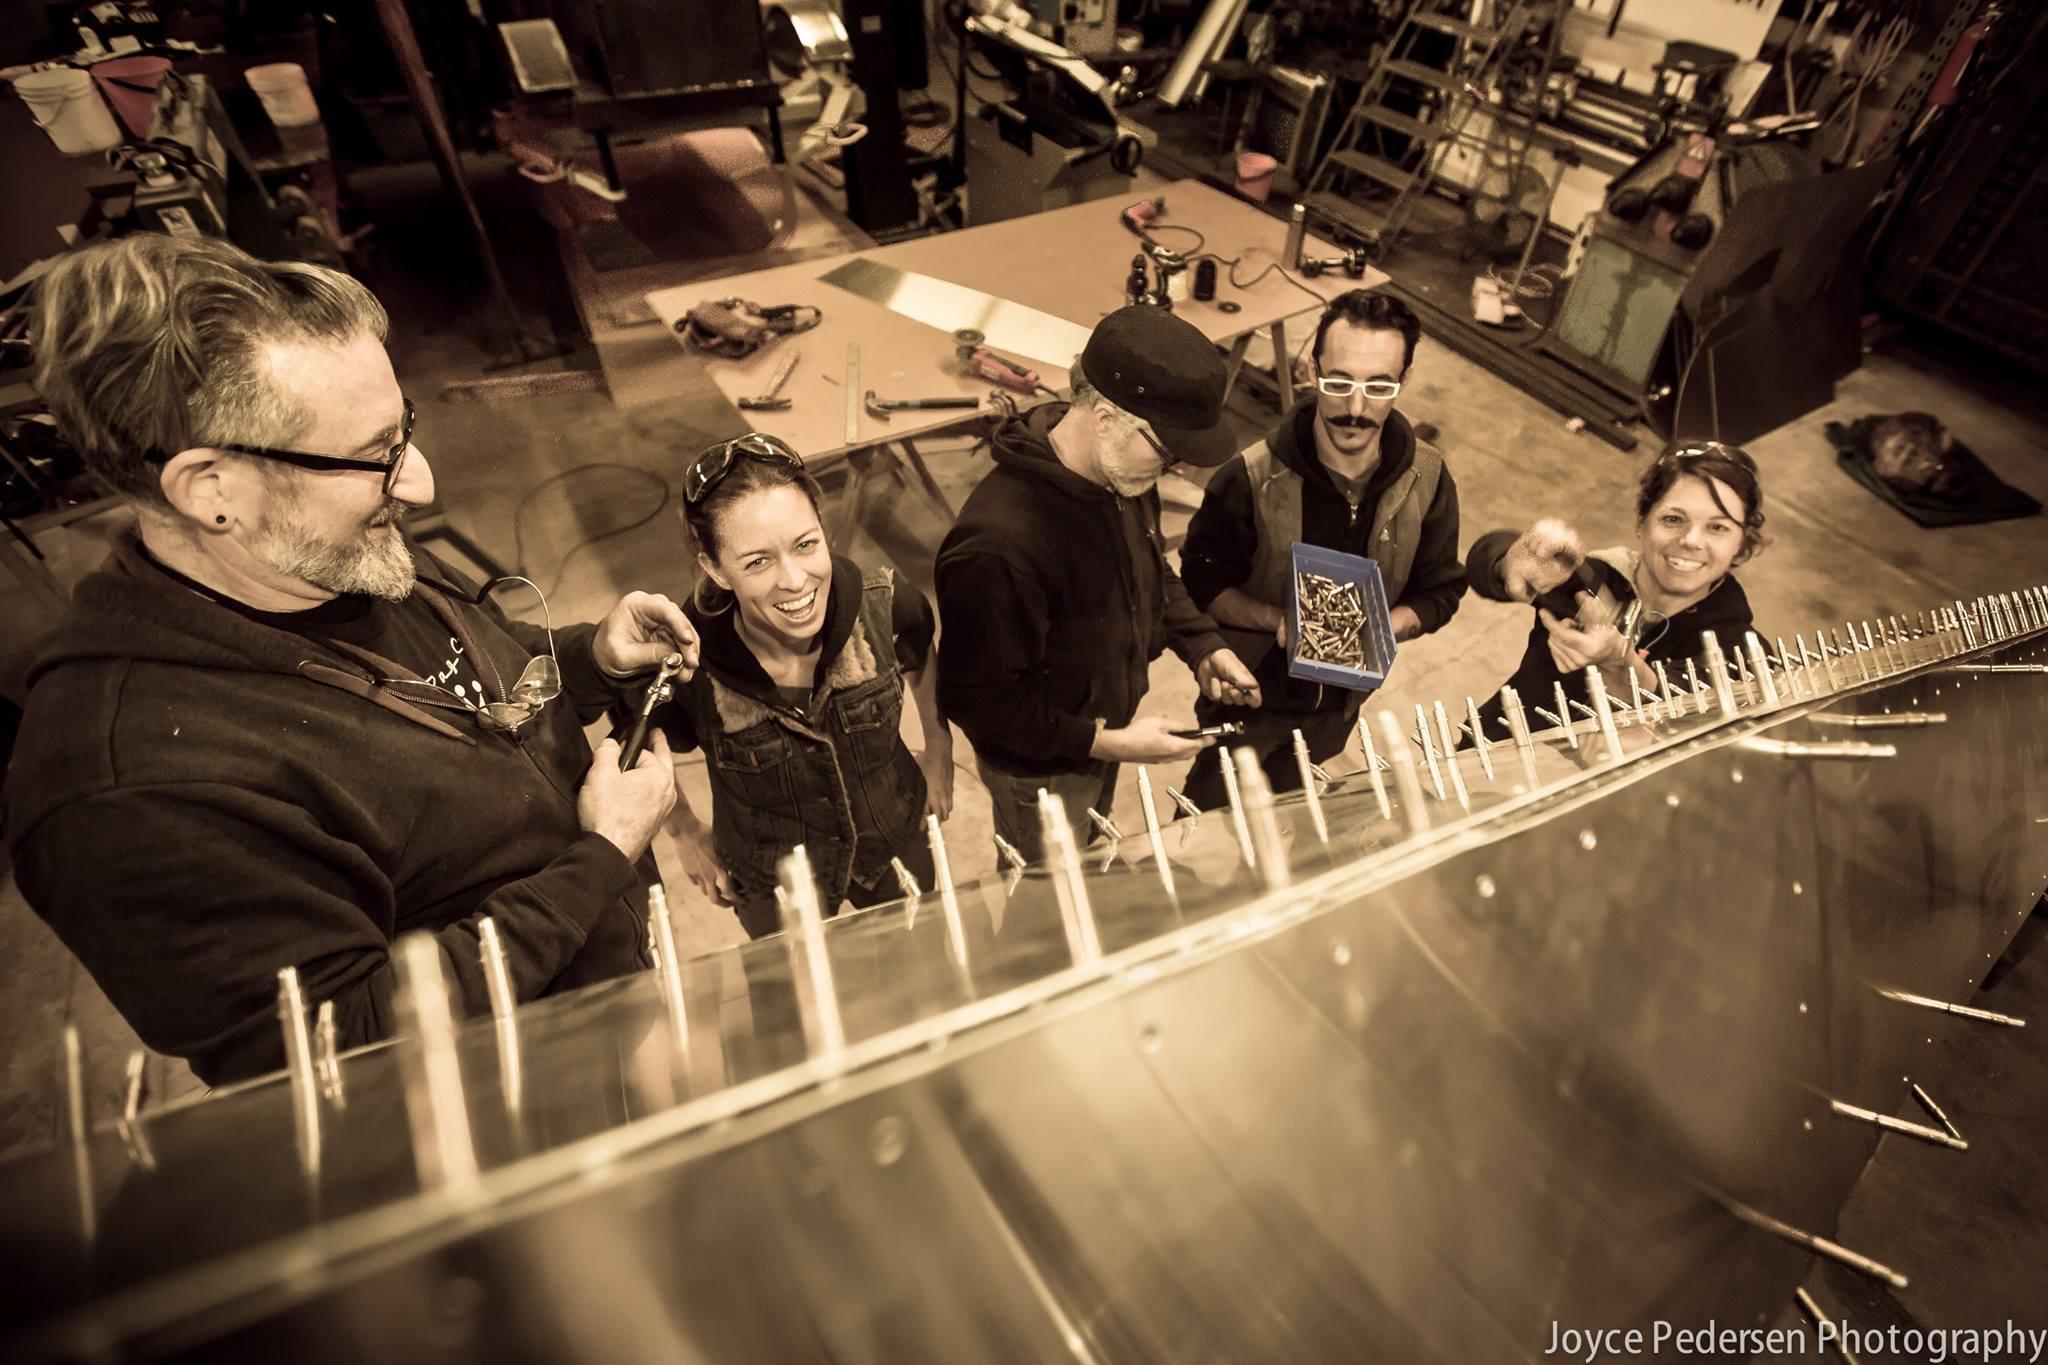 Refurbishing the RGR for Denver. Photo by Joyce Pedersen.